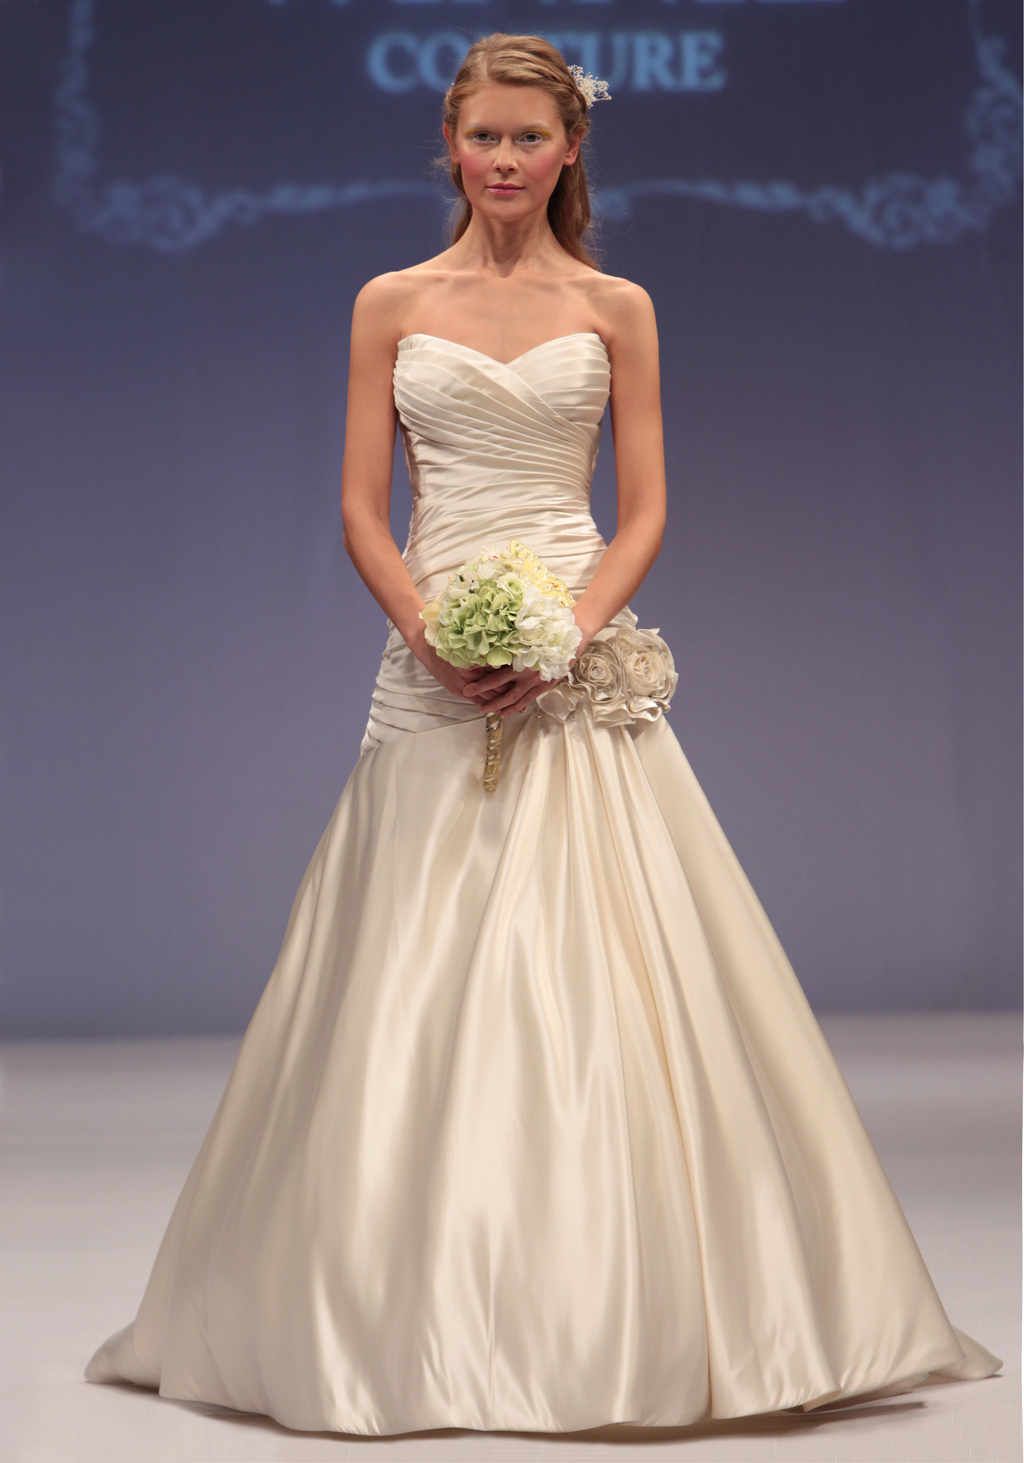 Plus size wedding dresses perth cool plus size evening wear couture wedding dresses perth wedding dress ideas with plus size wedding dresses perth ombrellifo Choice Image